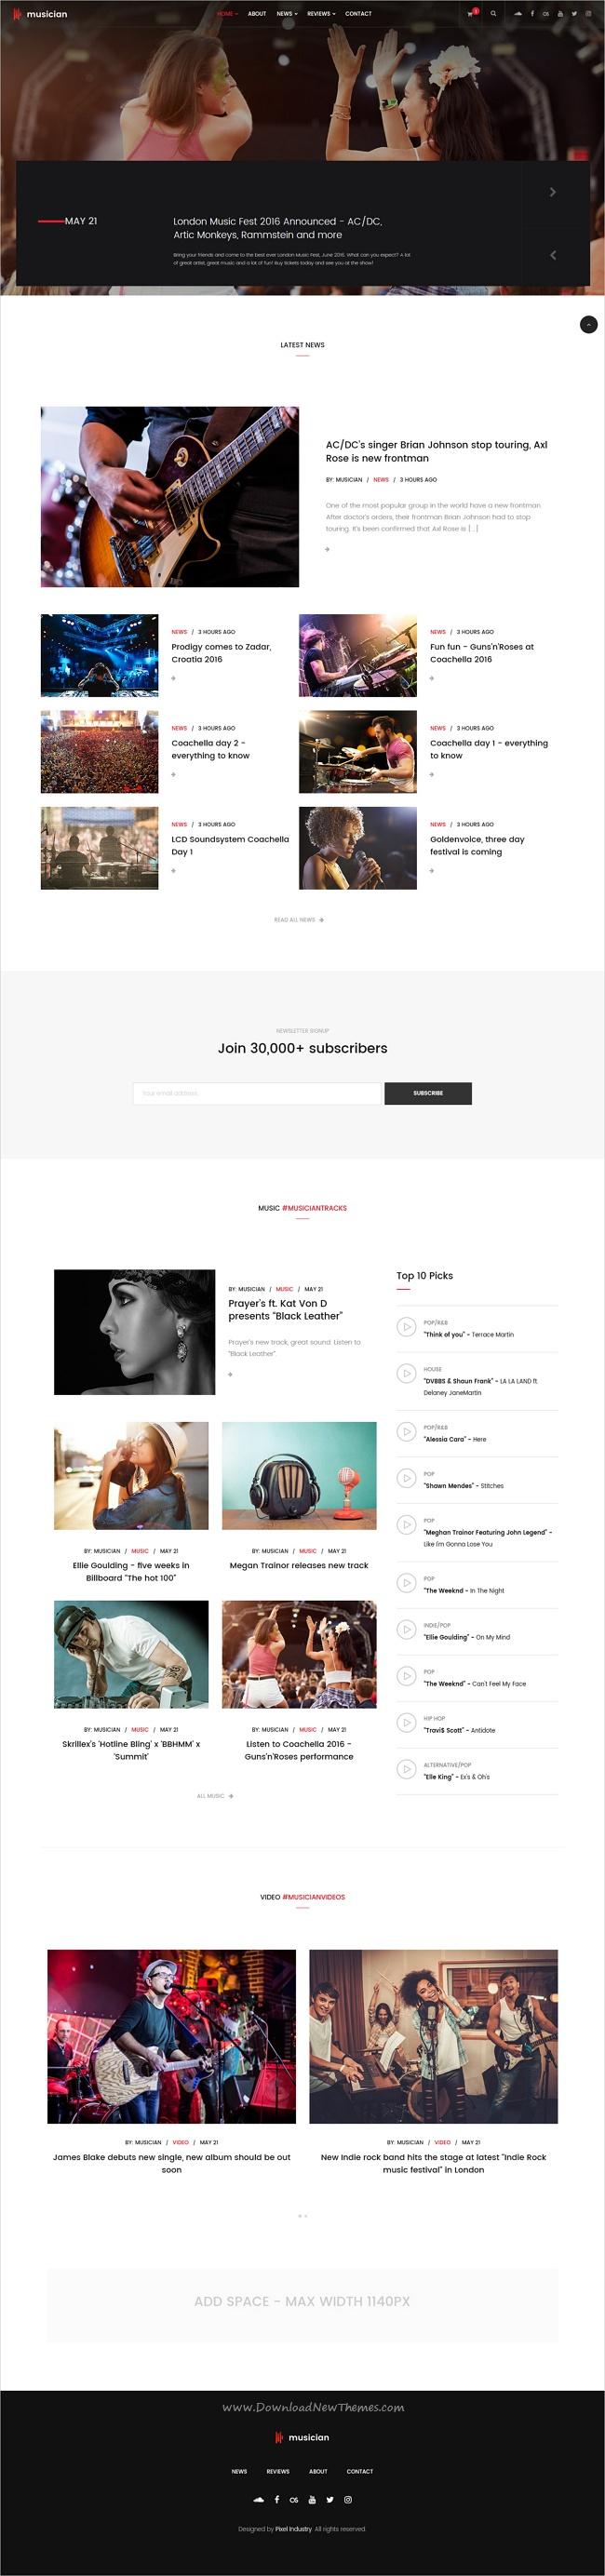 Musician - Music Band, Blog, Shop HTML Template